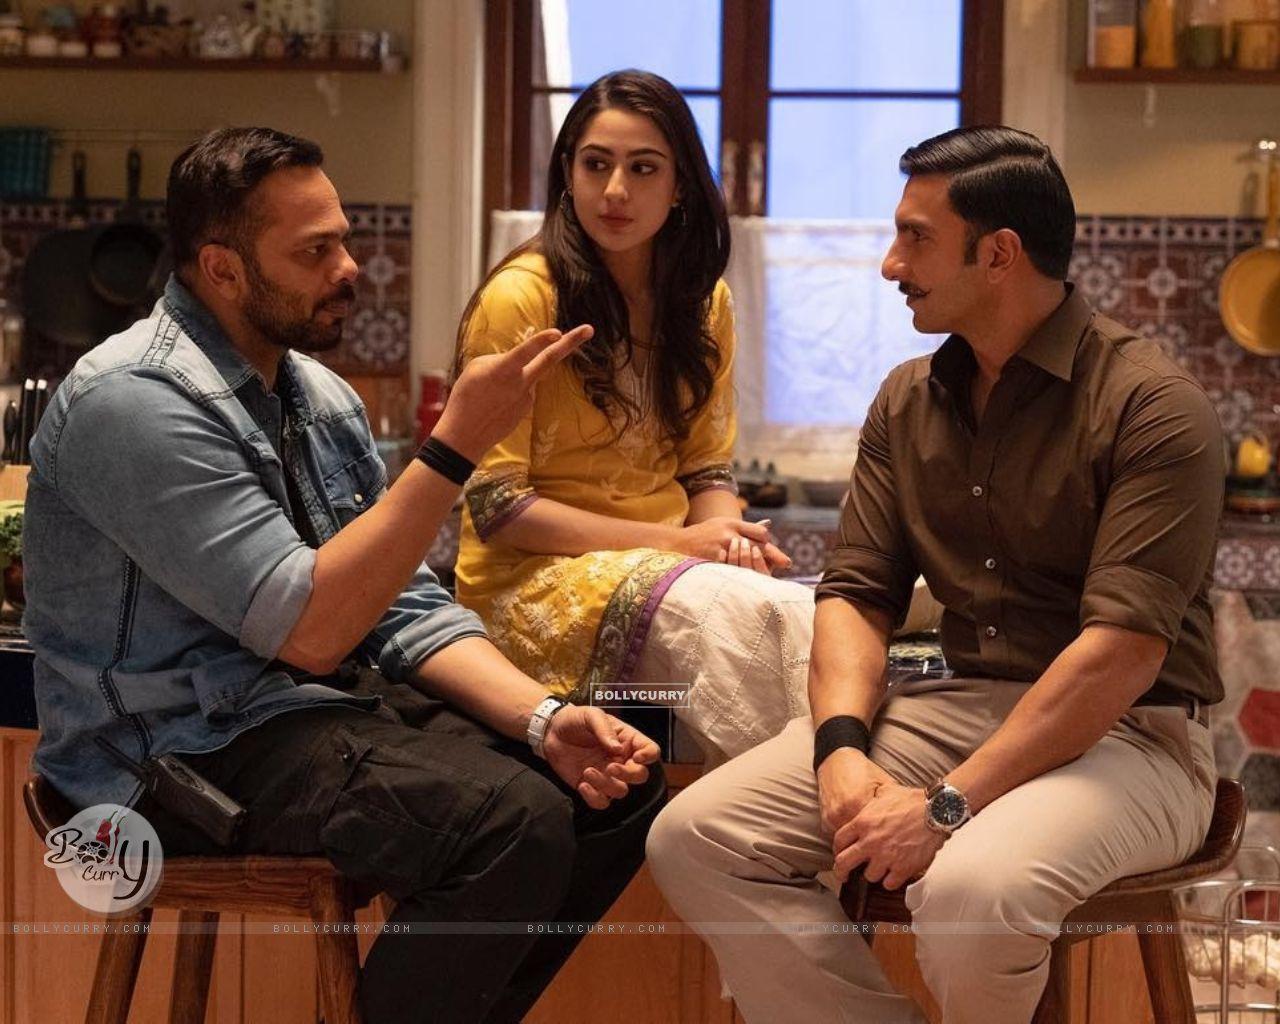 Ranvir Singh, Sara Ali Khan, Rohit Shetty stills from movie Simmba (442752) size:1280x1024